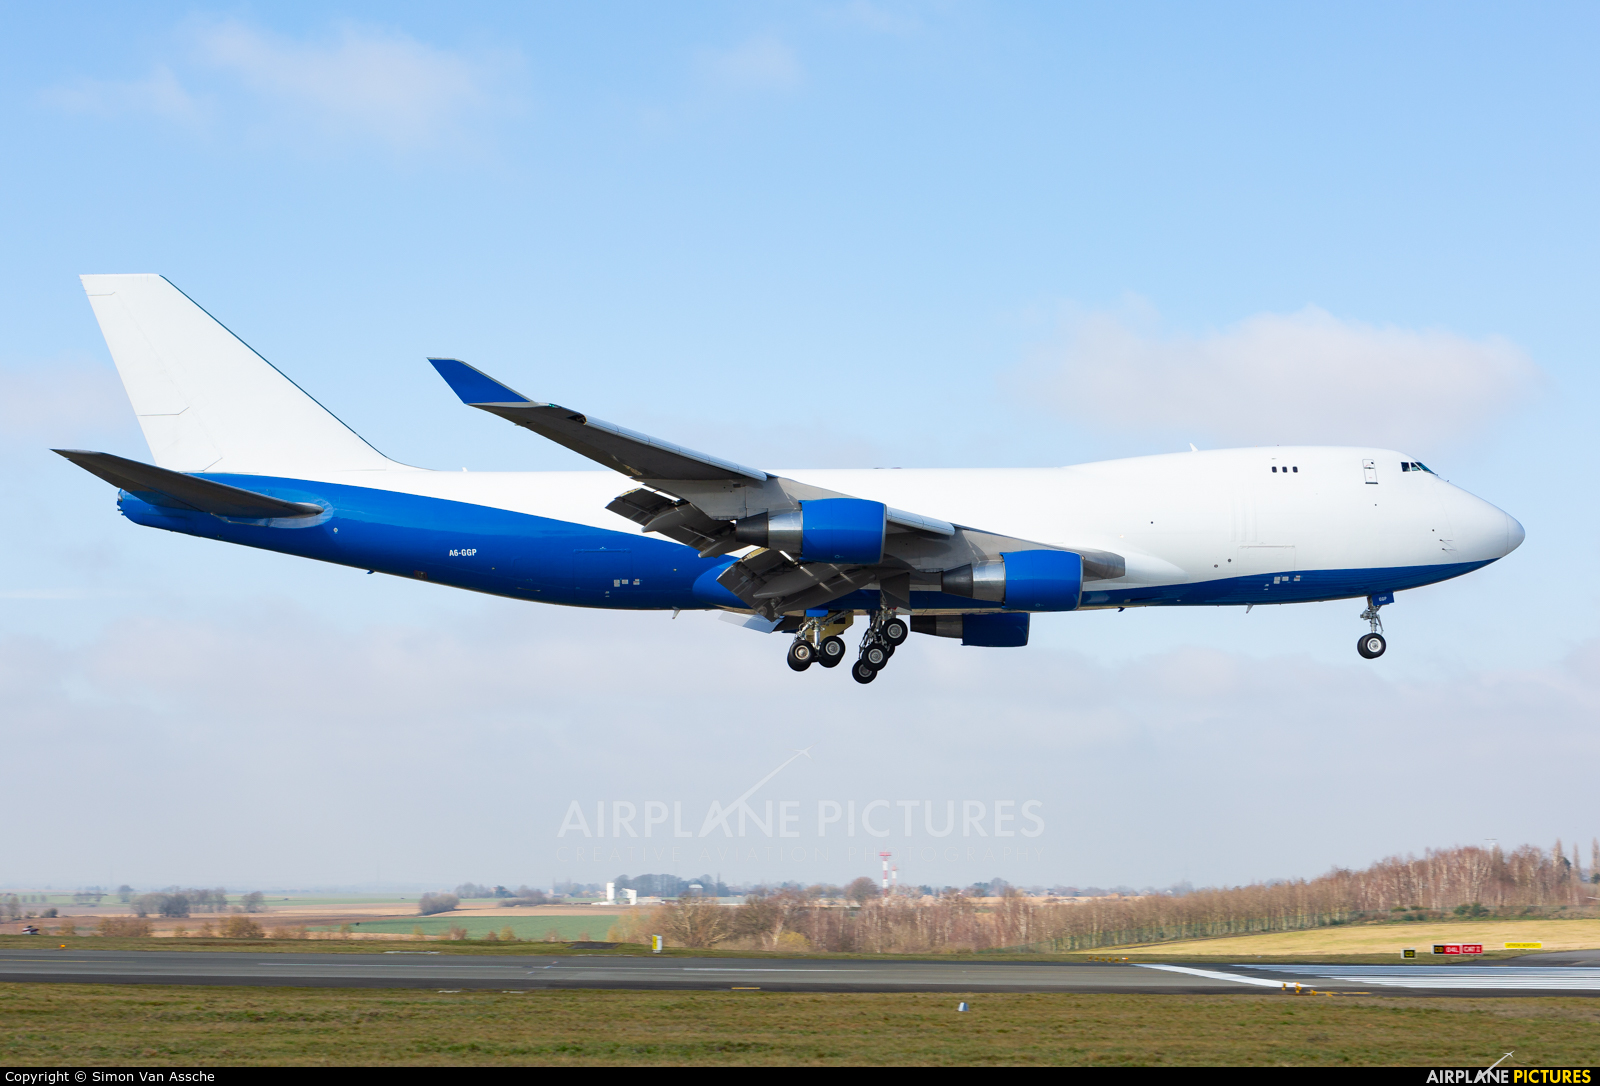 United Arab Emirates - Government A6-GGP aircraft at Liège-Bierset